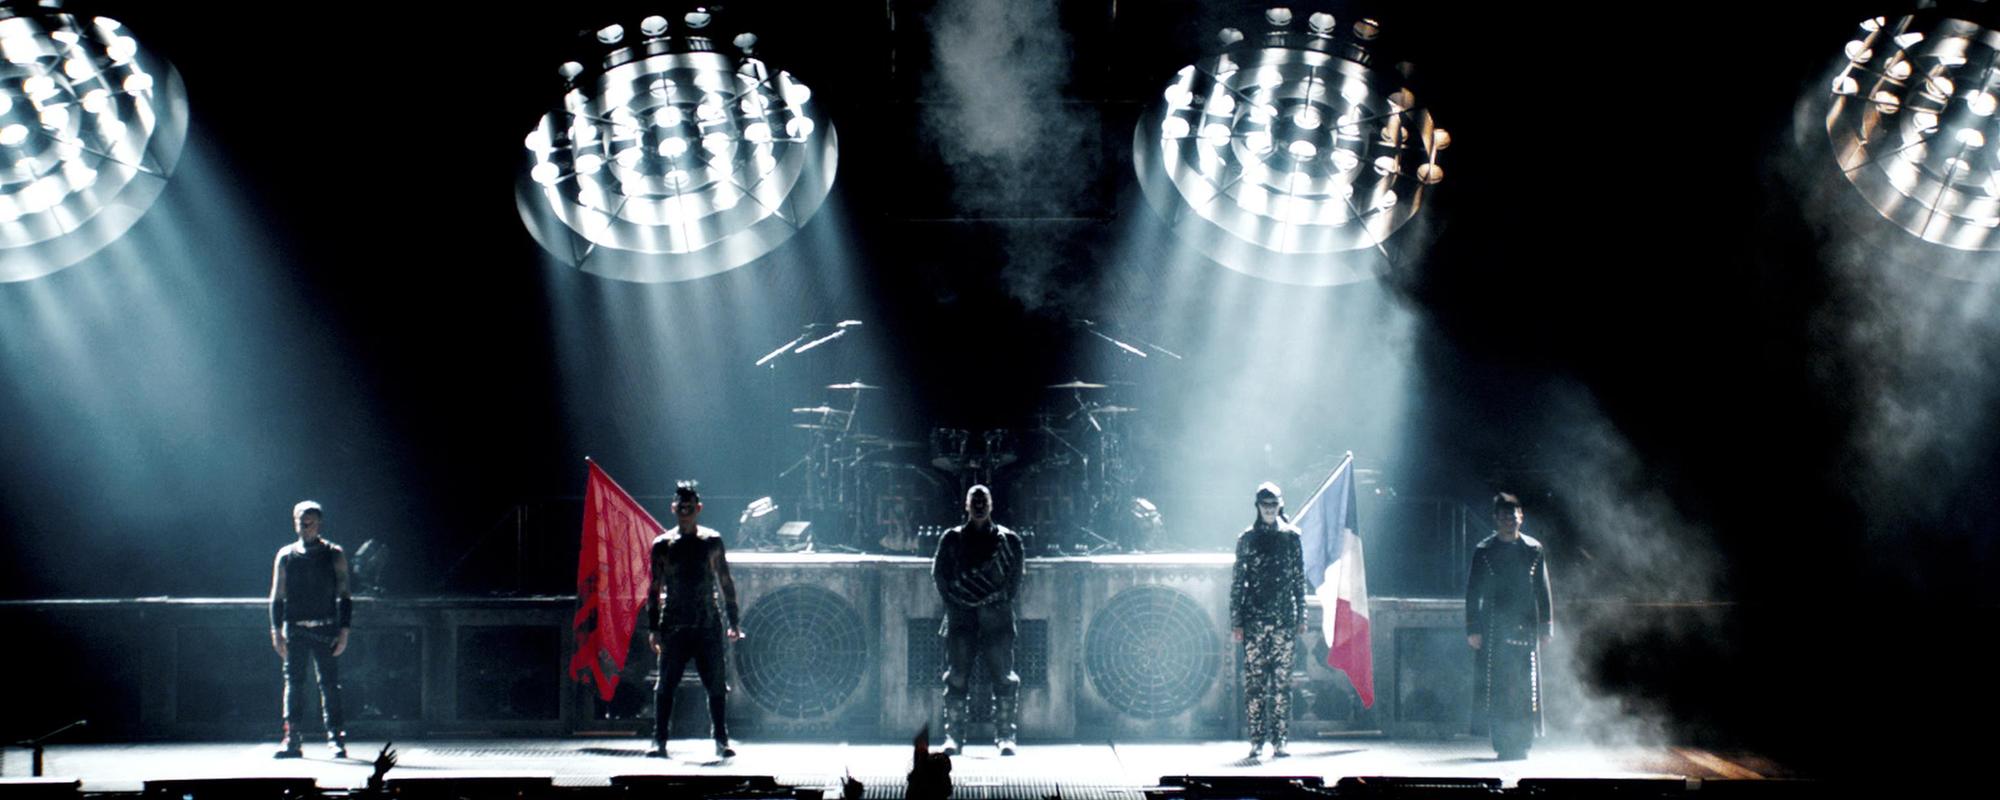 Avant Première 2017 Market Screening Rammstein Paris Imz